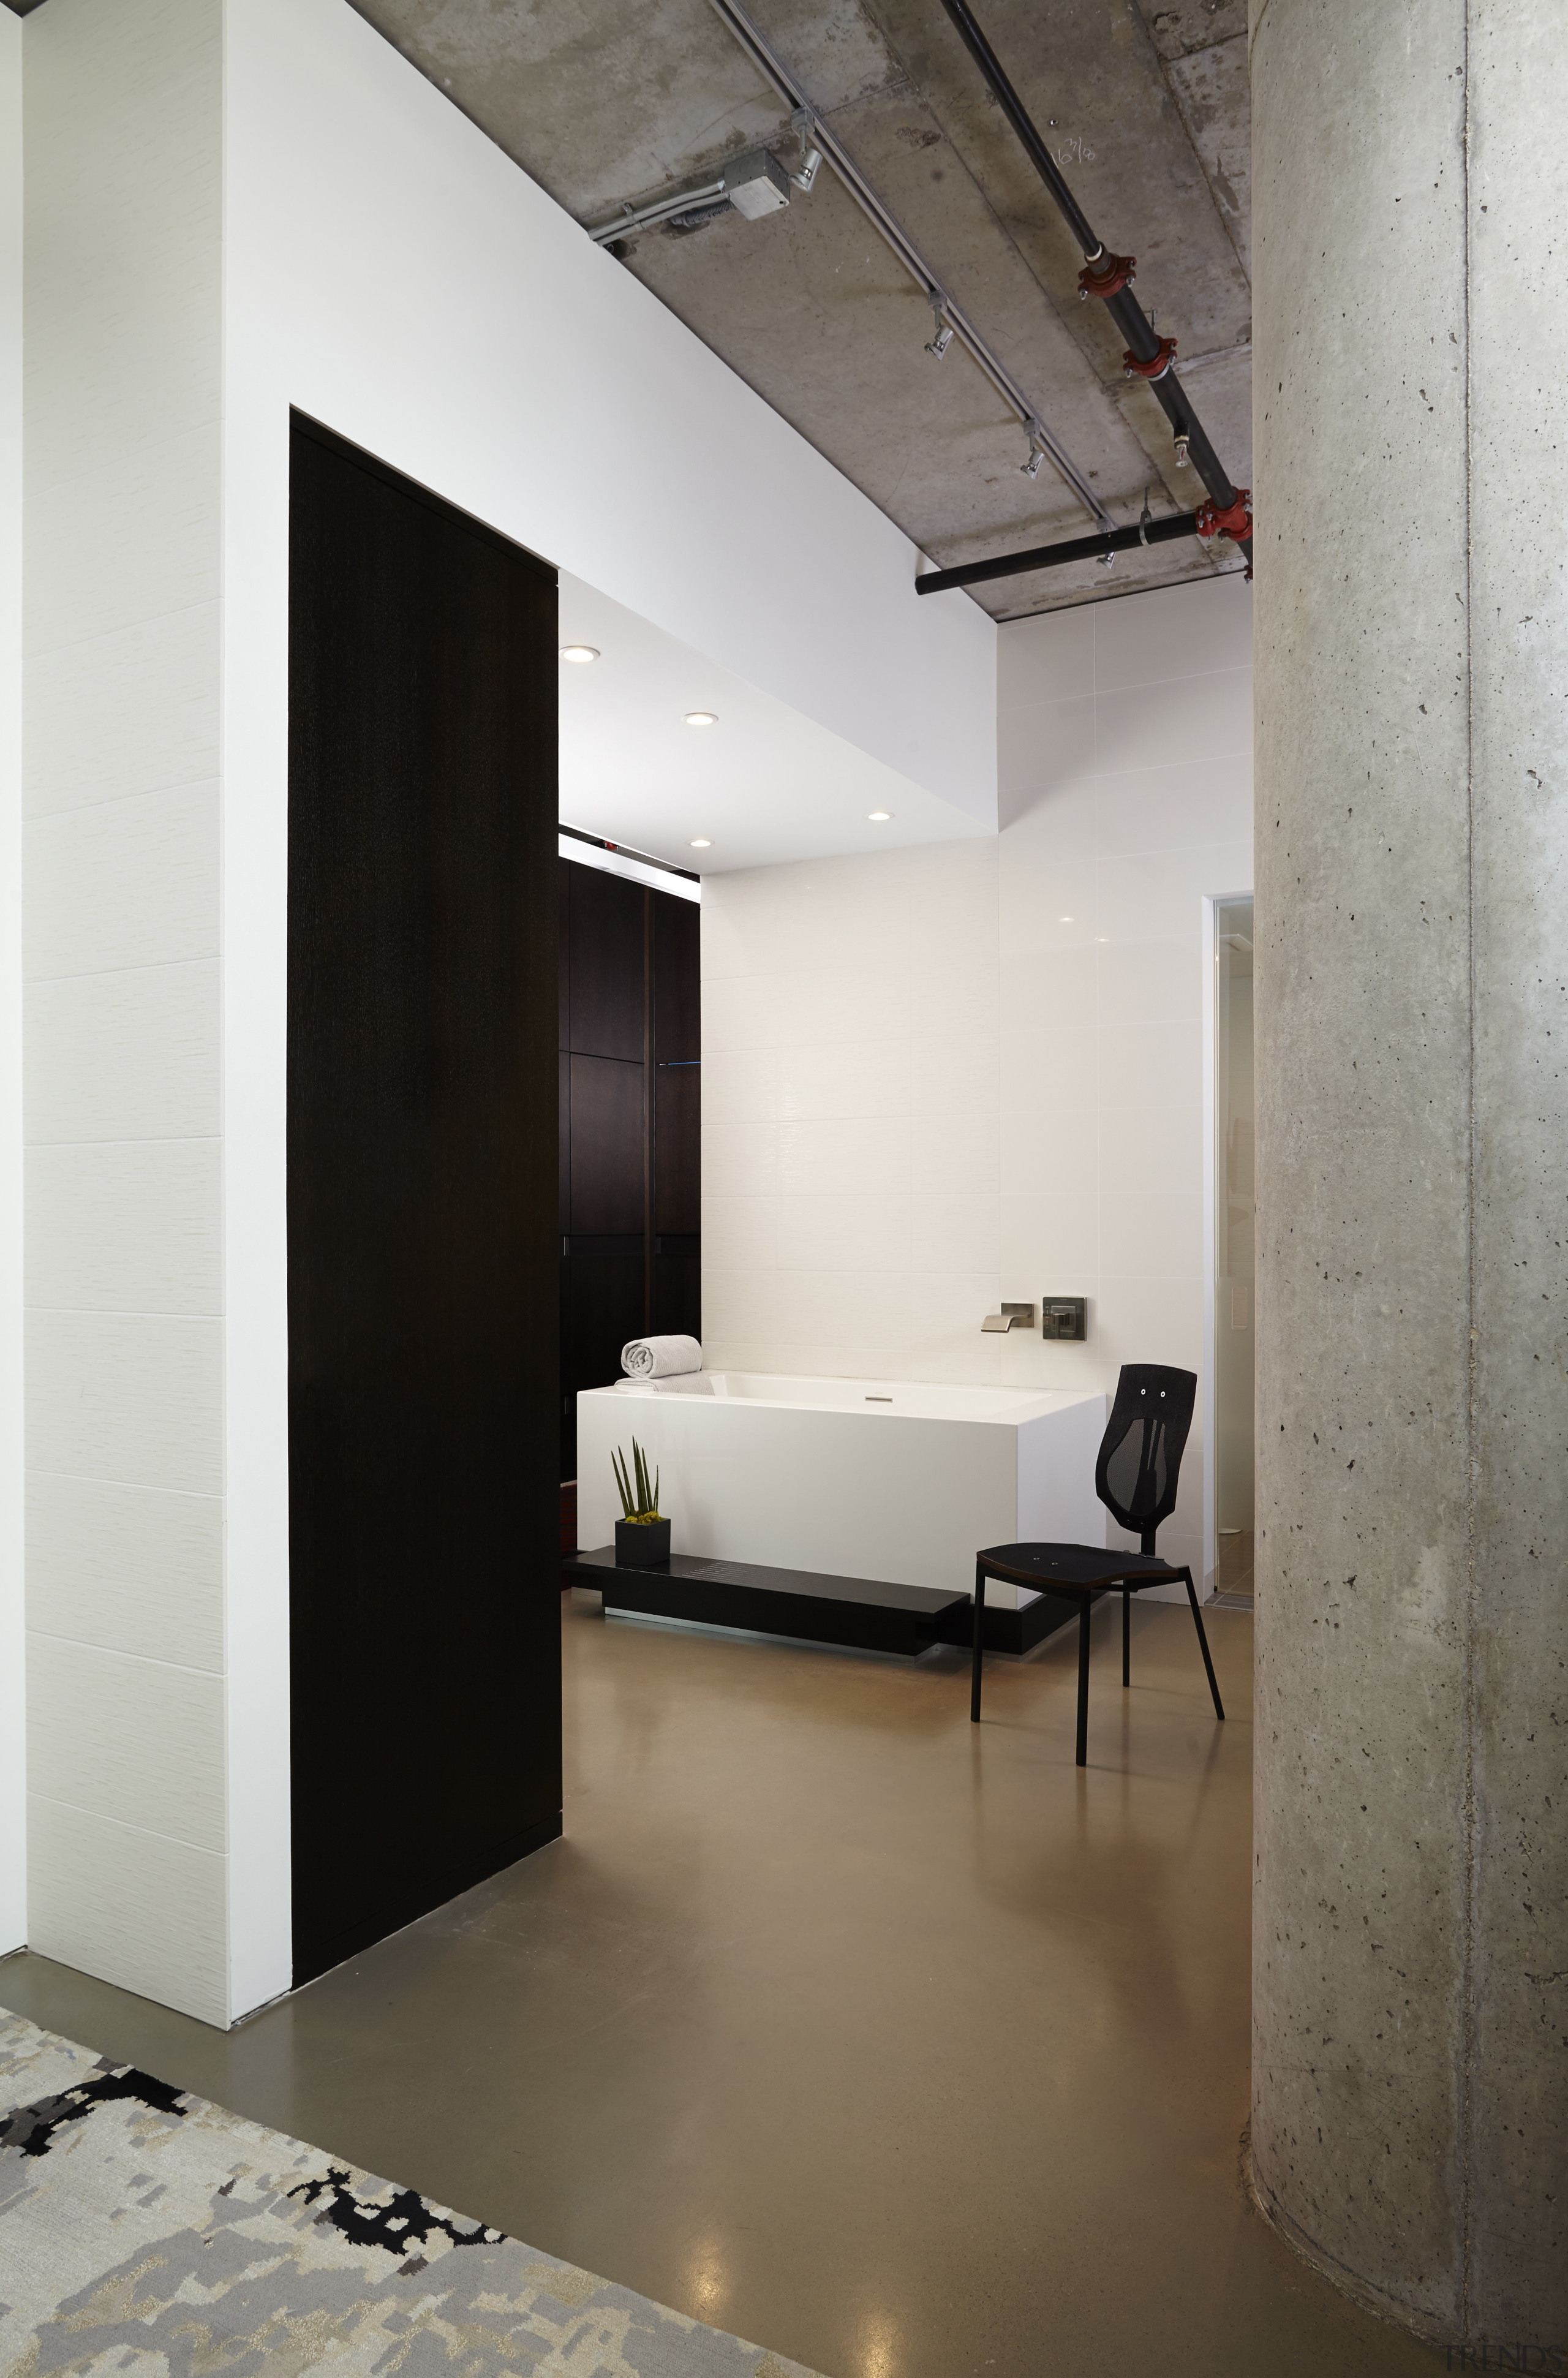 This bathroom refit by designer Jodi Gillespie complements architecture, ceiling, floor, flooring, interior design, loft, product design, gray